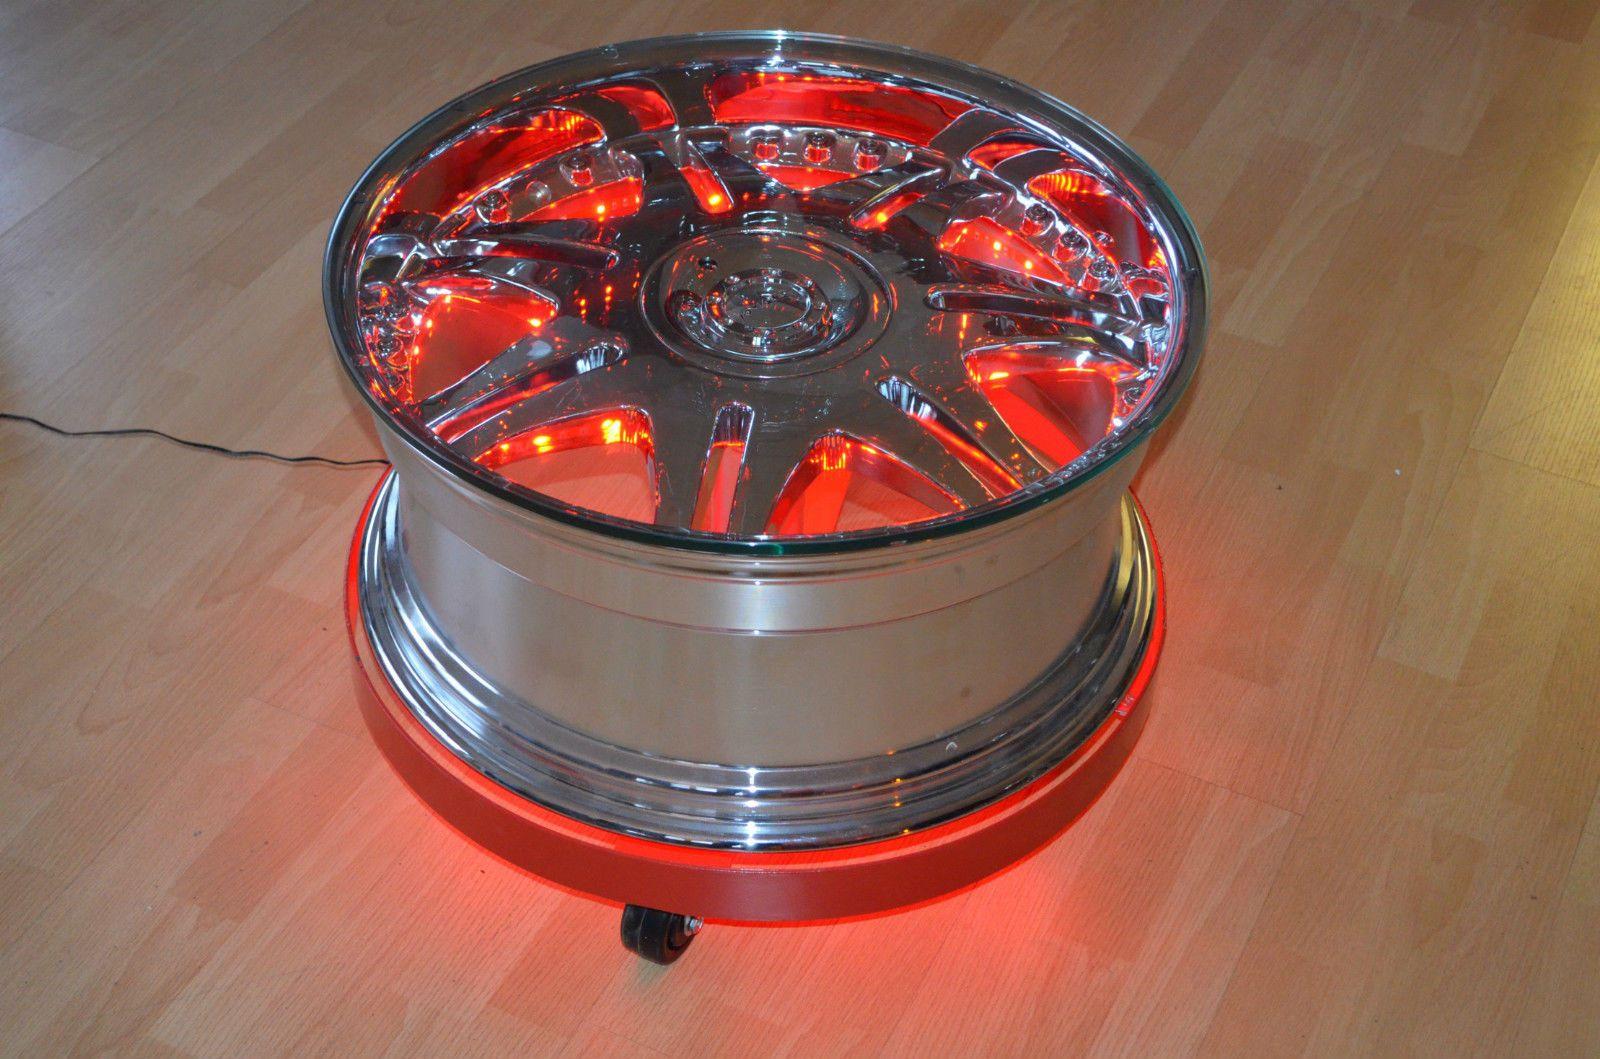 felgentisch beleuchtet felgen reifen tisch v8 motortisch zapfs ule tanks ule ebay home. Black Bedroom Furniture Sets. Home Design Ideas